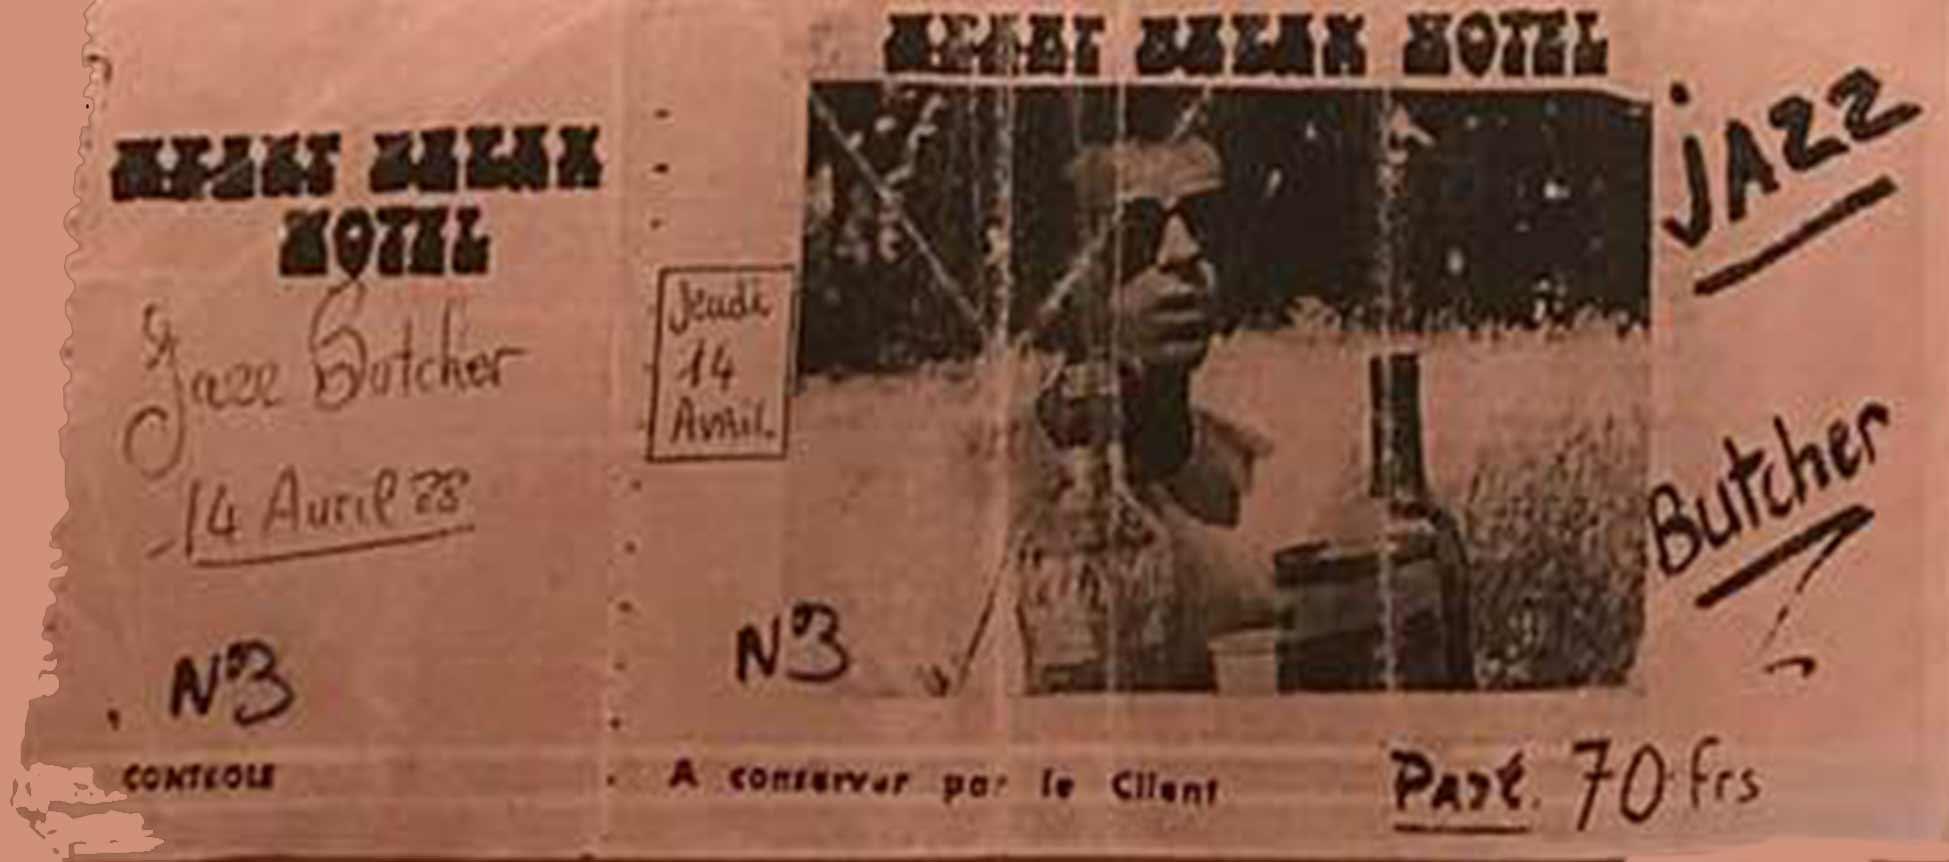 "14 avril 1988 Jazz Butcher à Sete ""Heartbreak Hotel"""